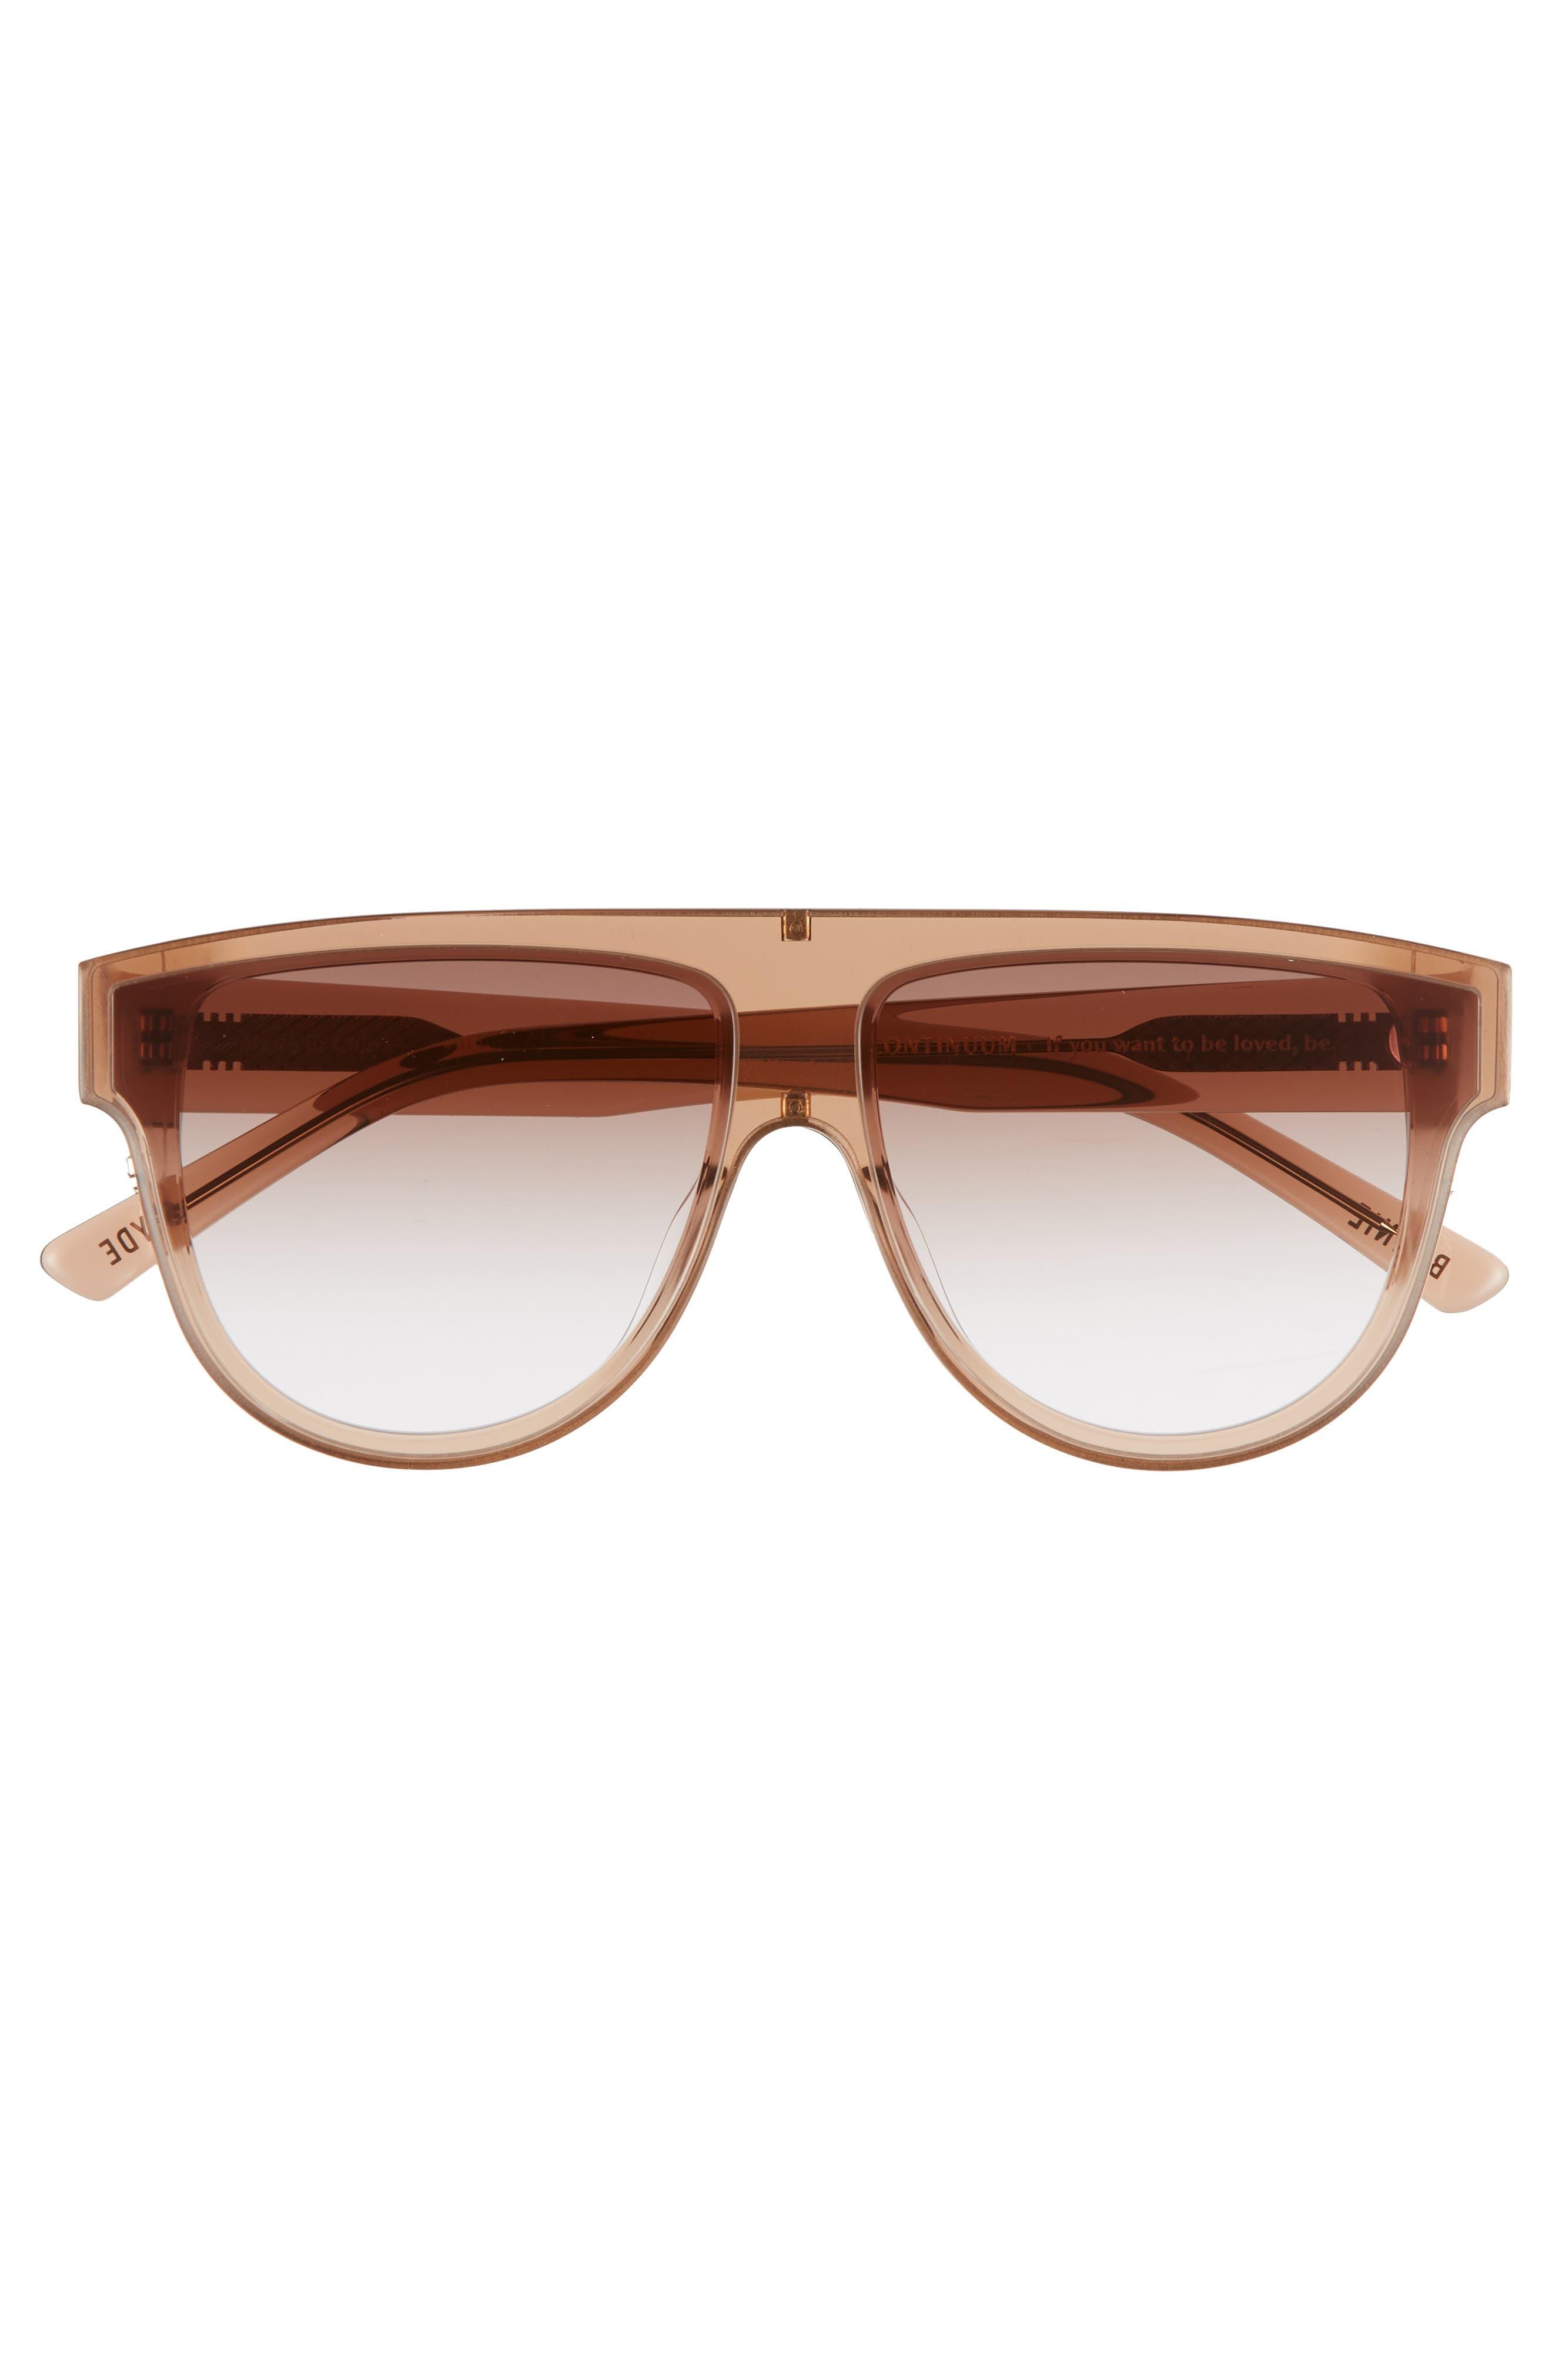 Continuum 63mm Oversize Flat Top Sunglasses,                             Alternate thumbnail 3, color,                             AMBER GRADIENT